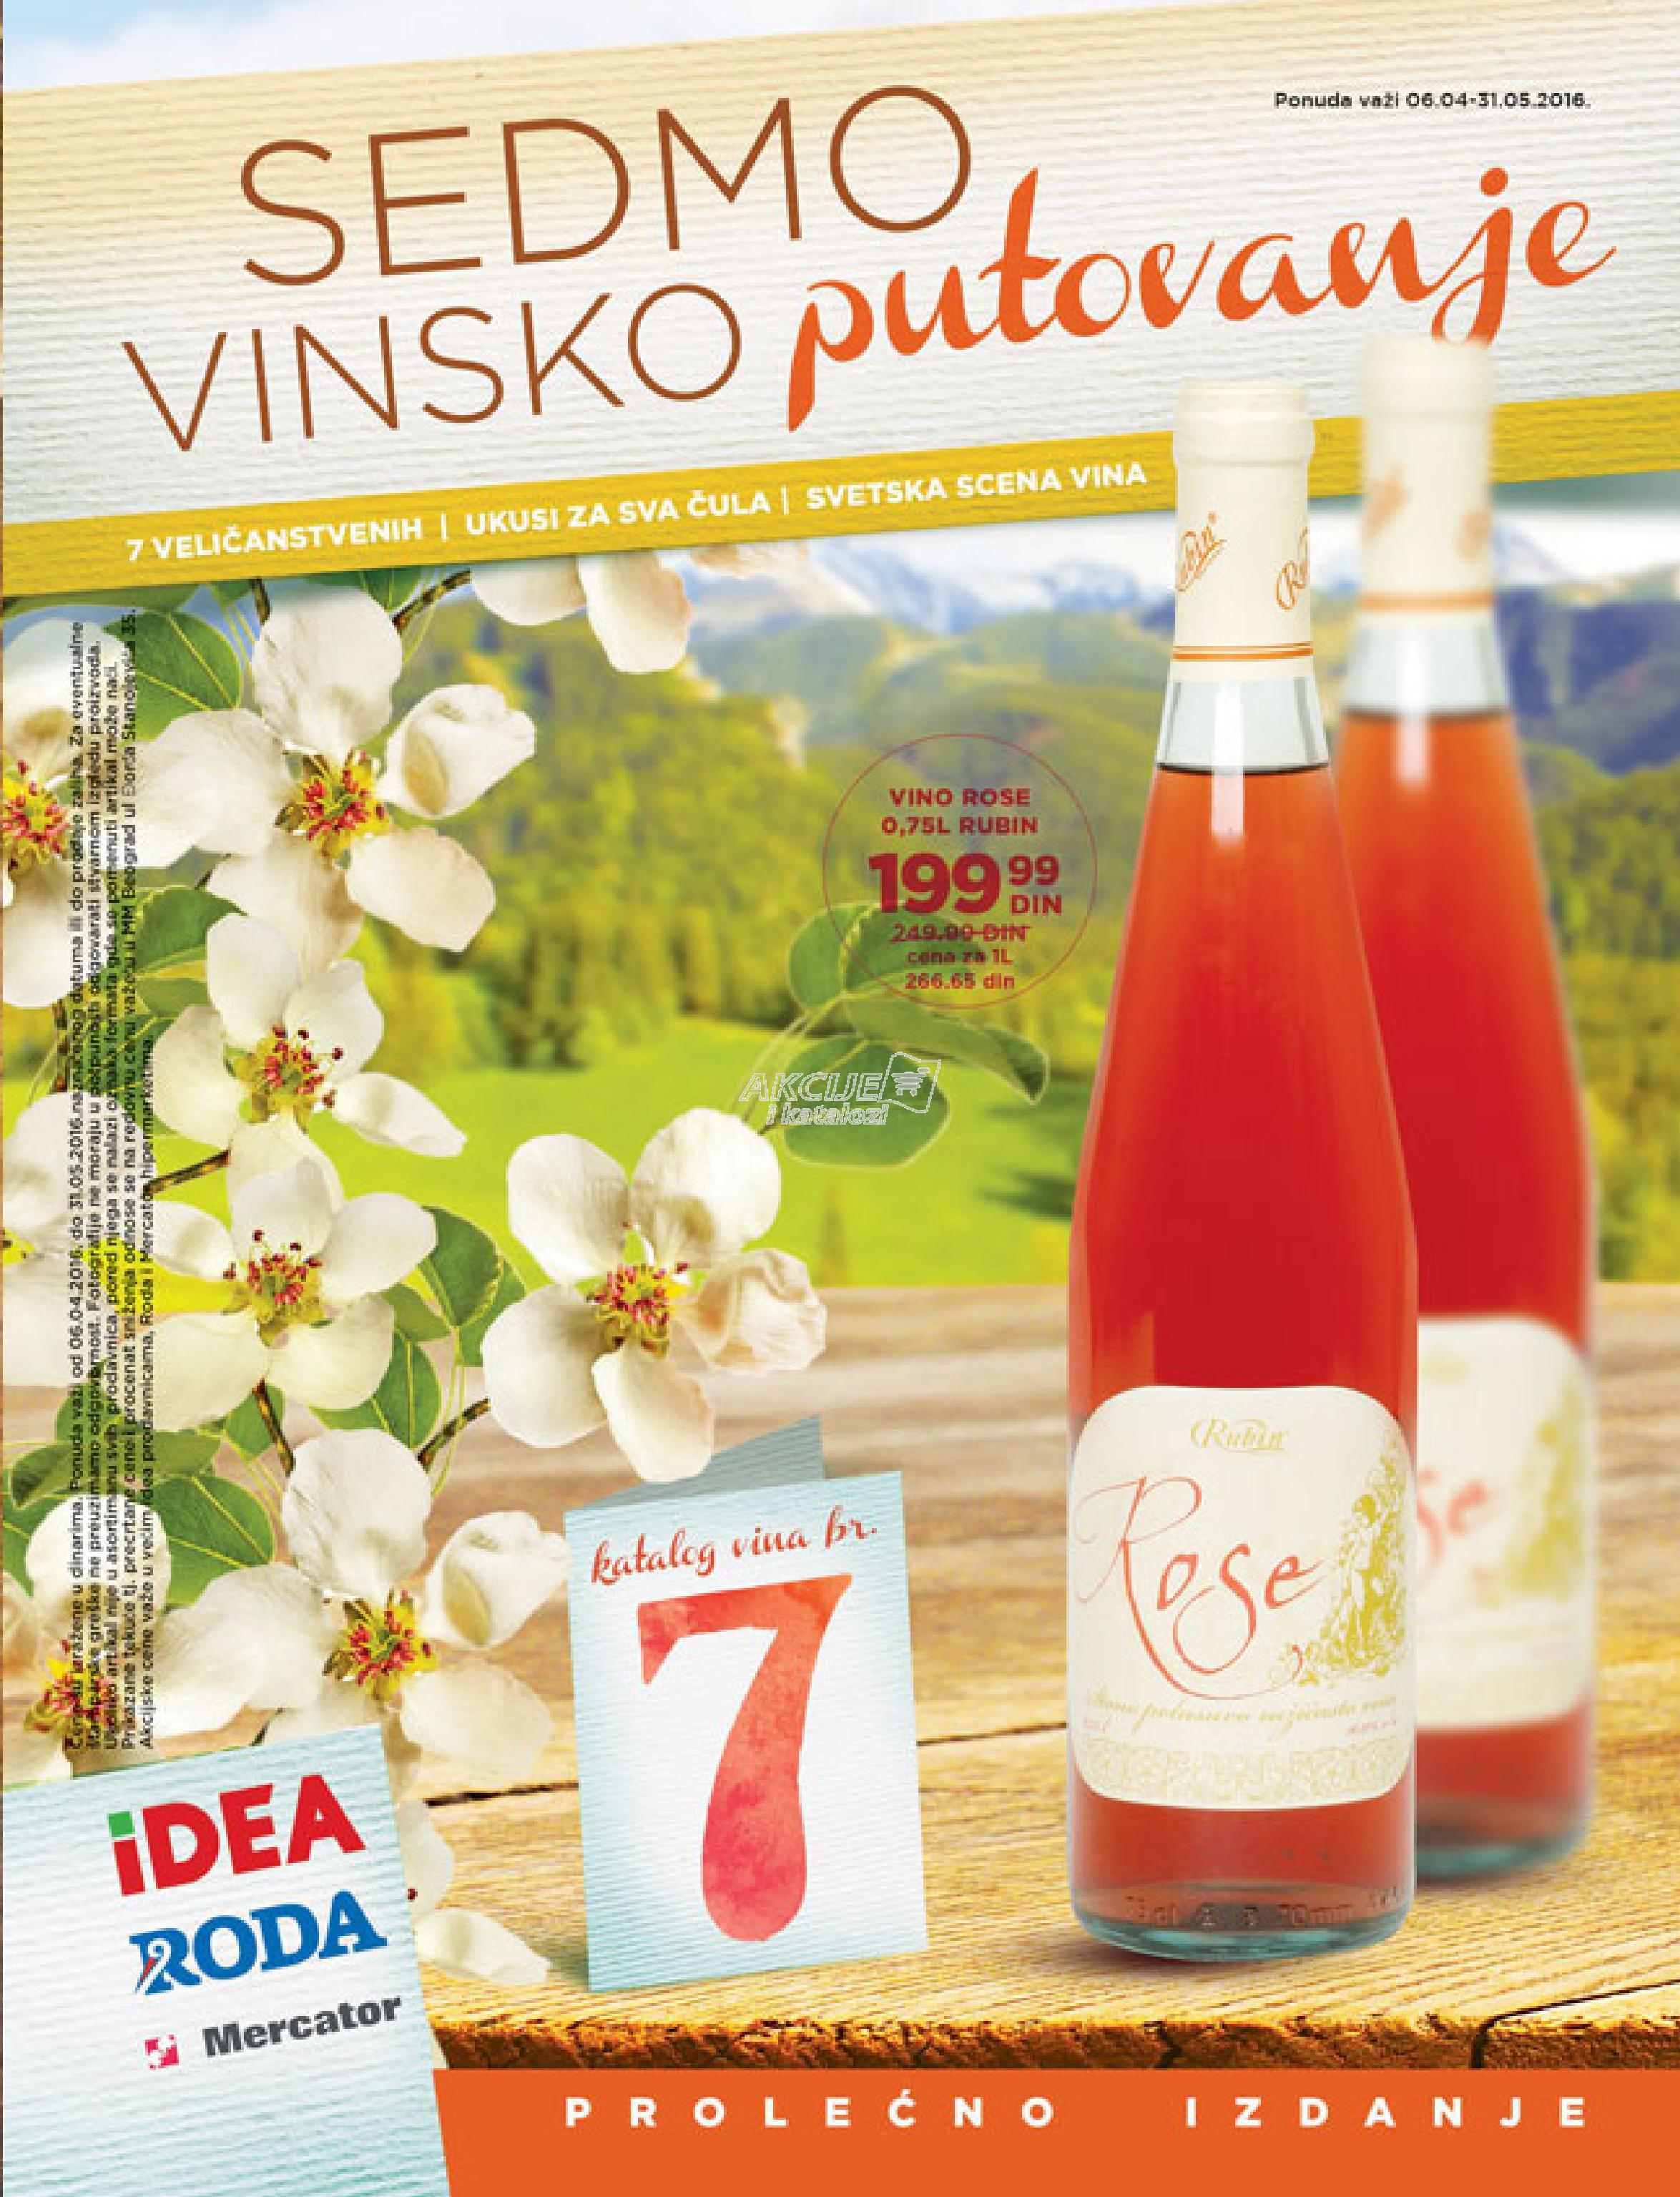 Idea - Redovna akcija specijal vina